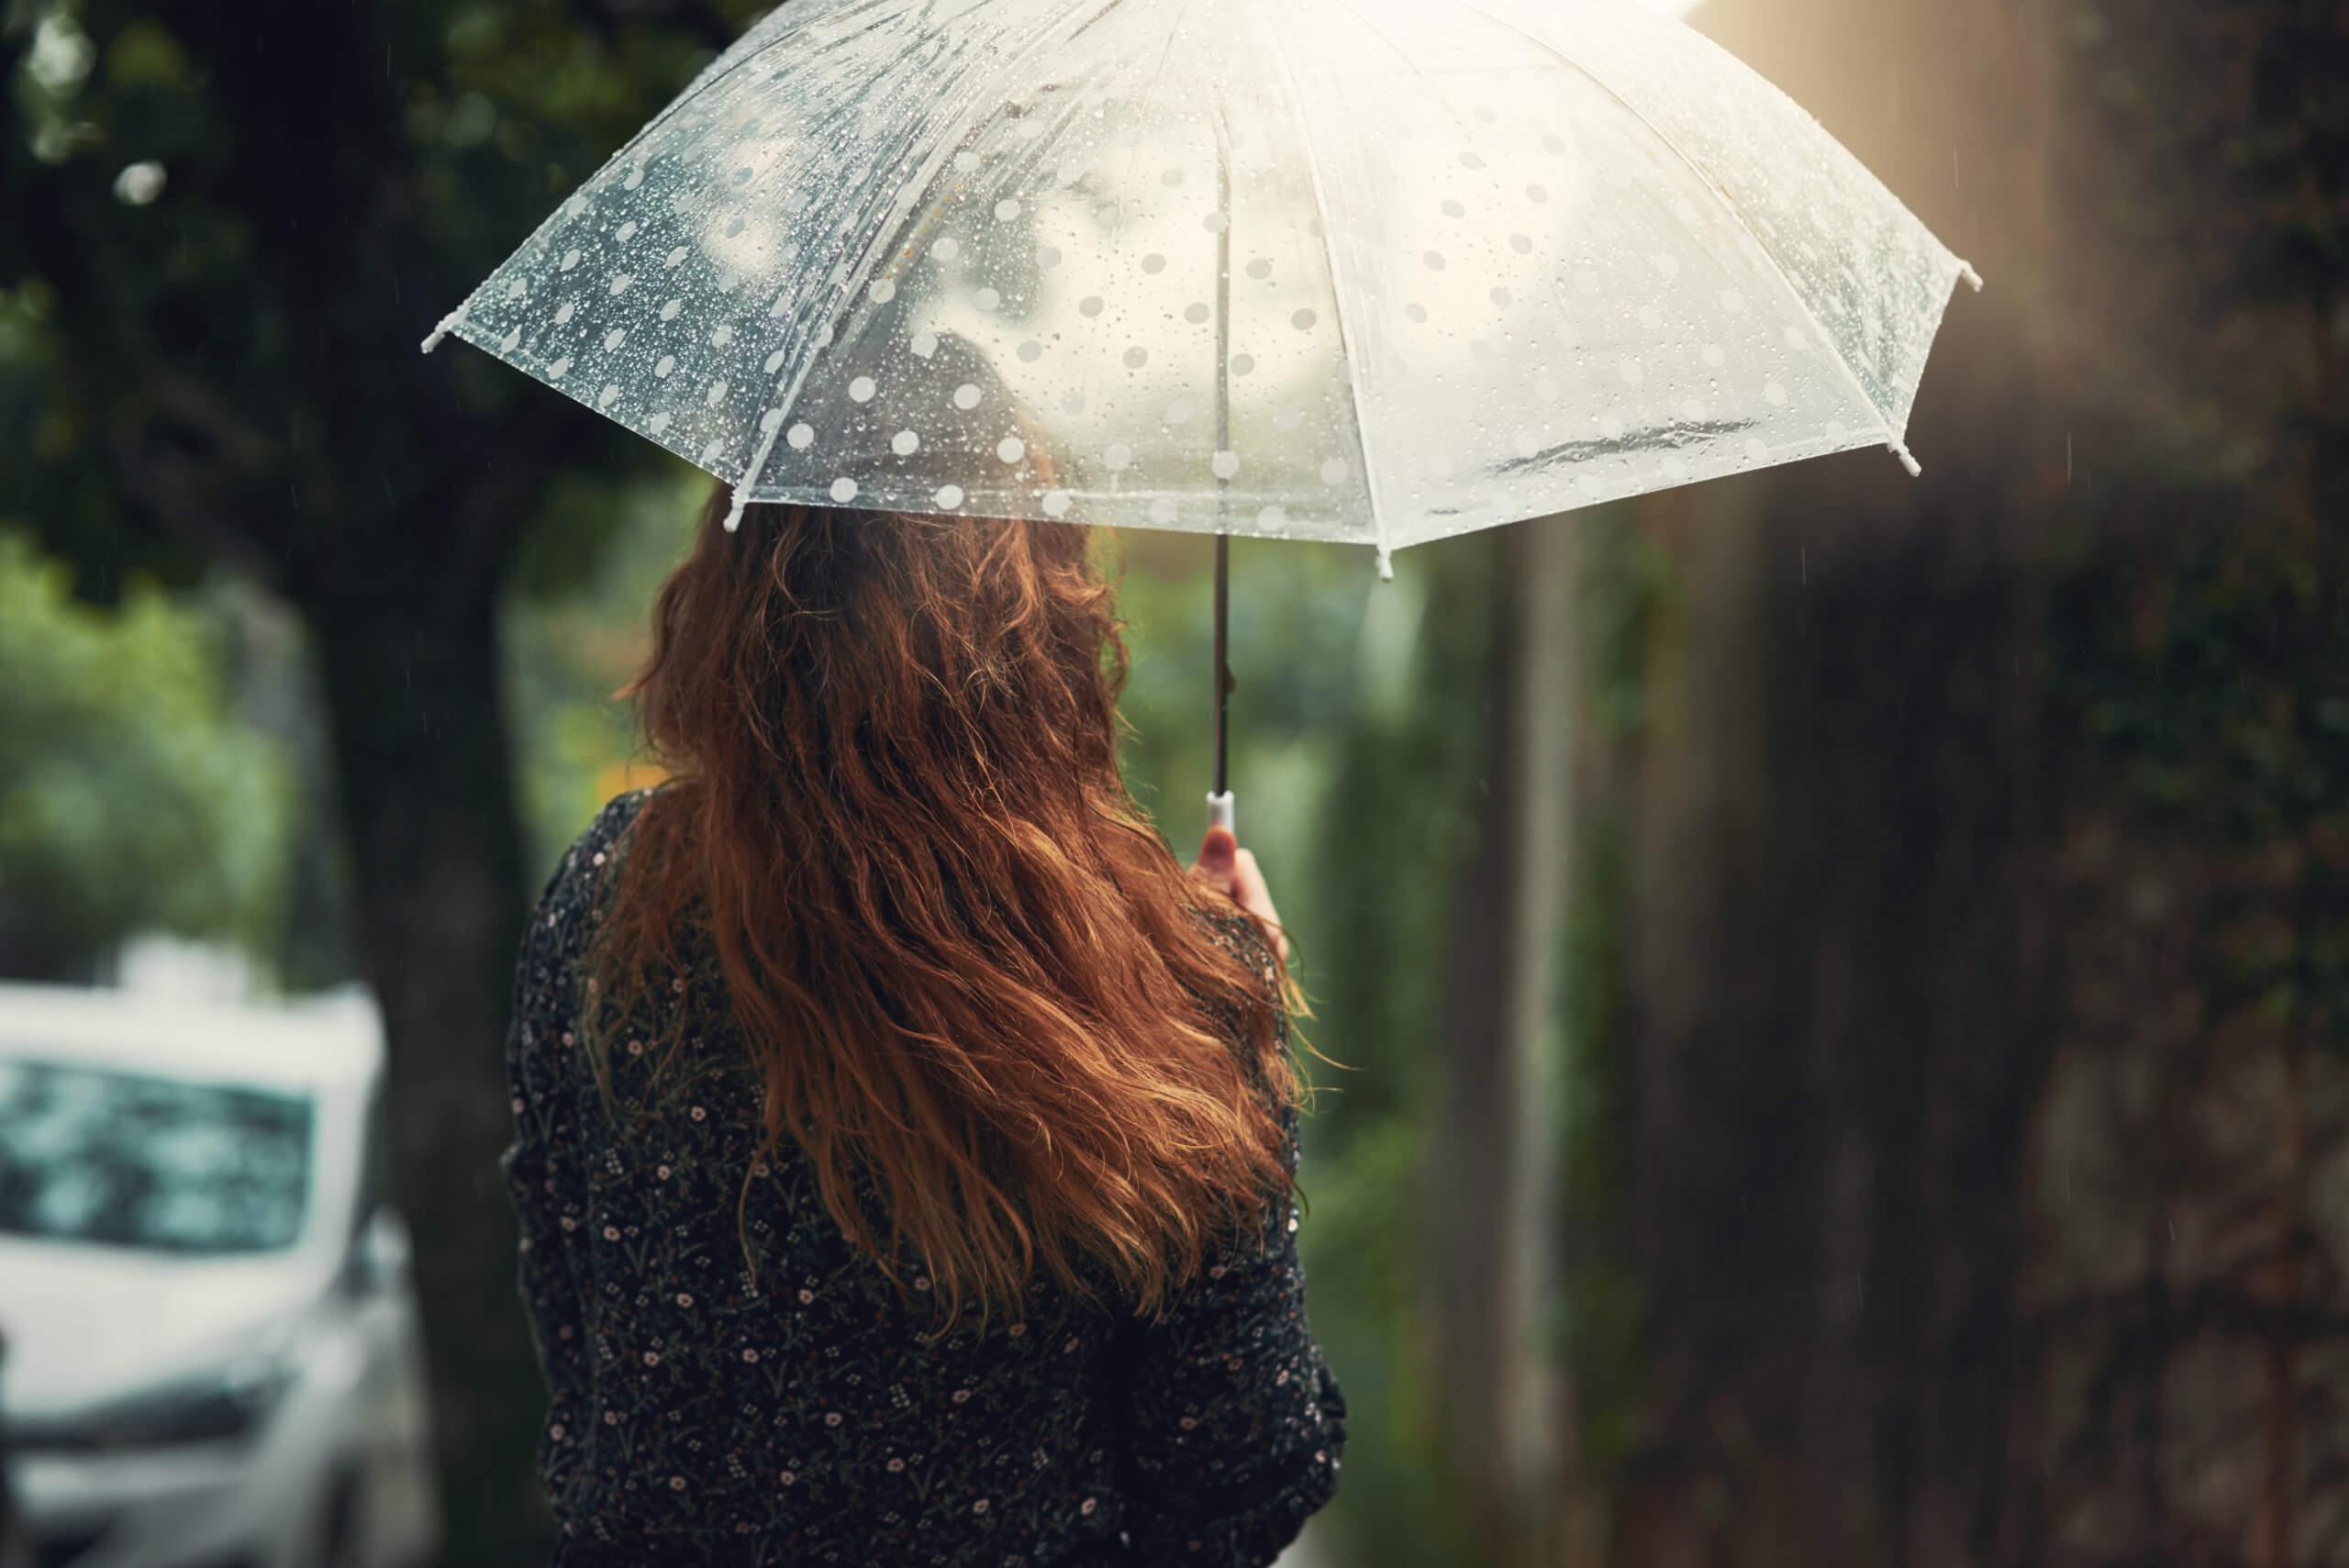 woman-under-umbrella-rain-protection